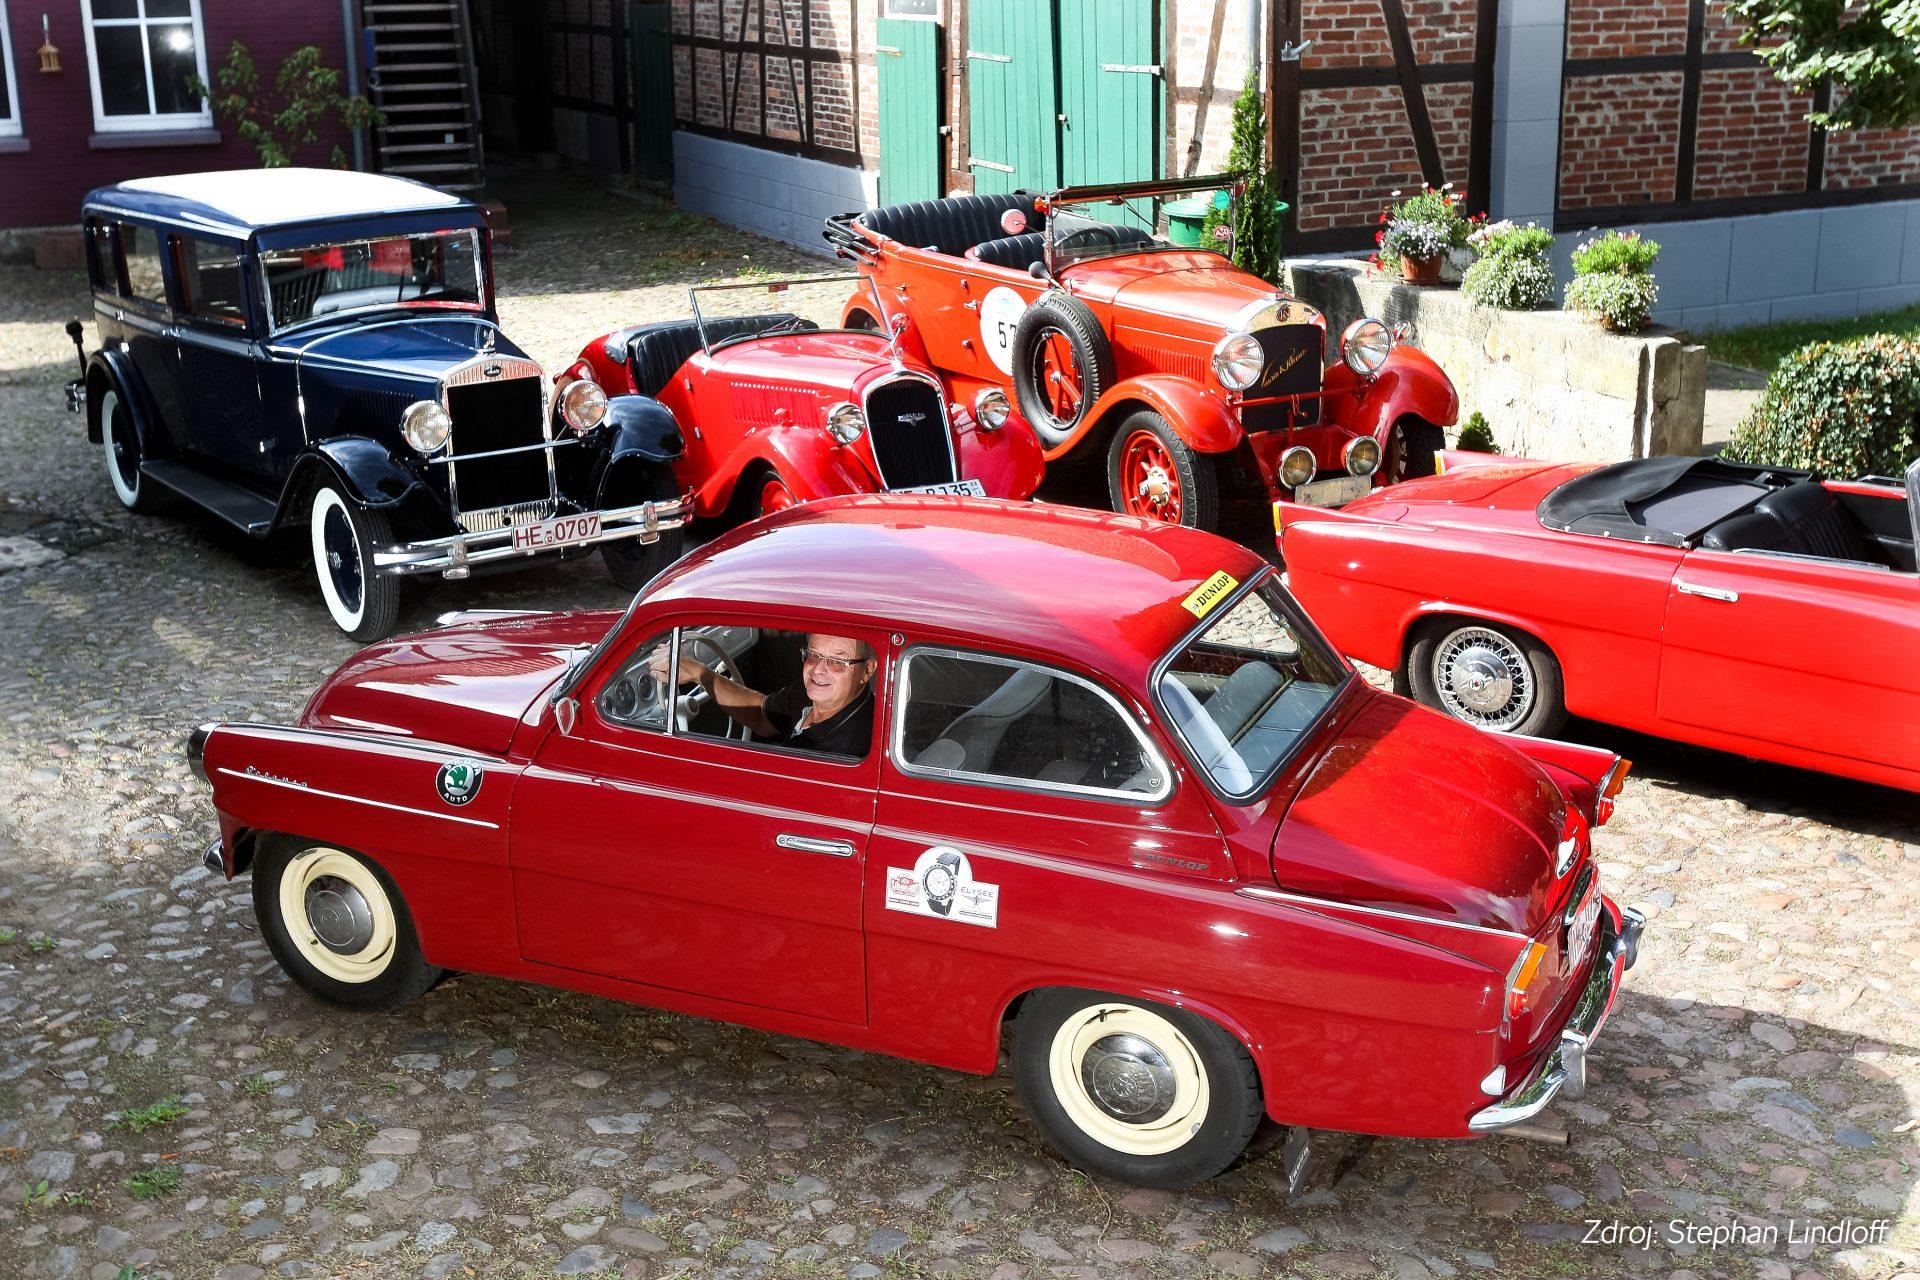 classic-car-sudeck-skoda-czech-1920x1280